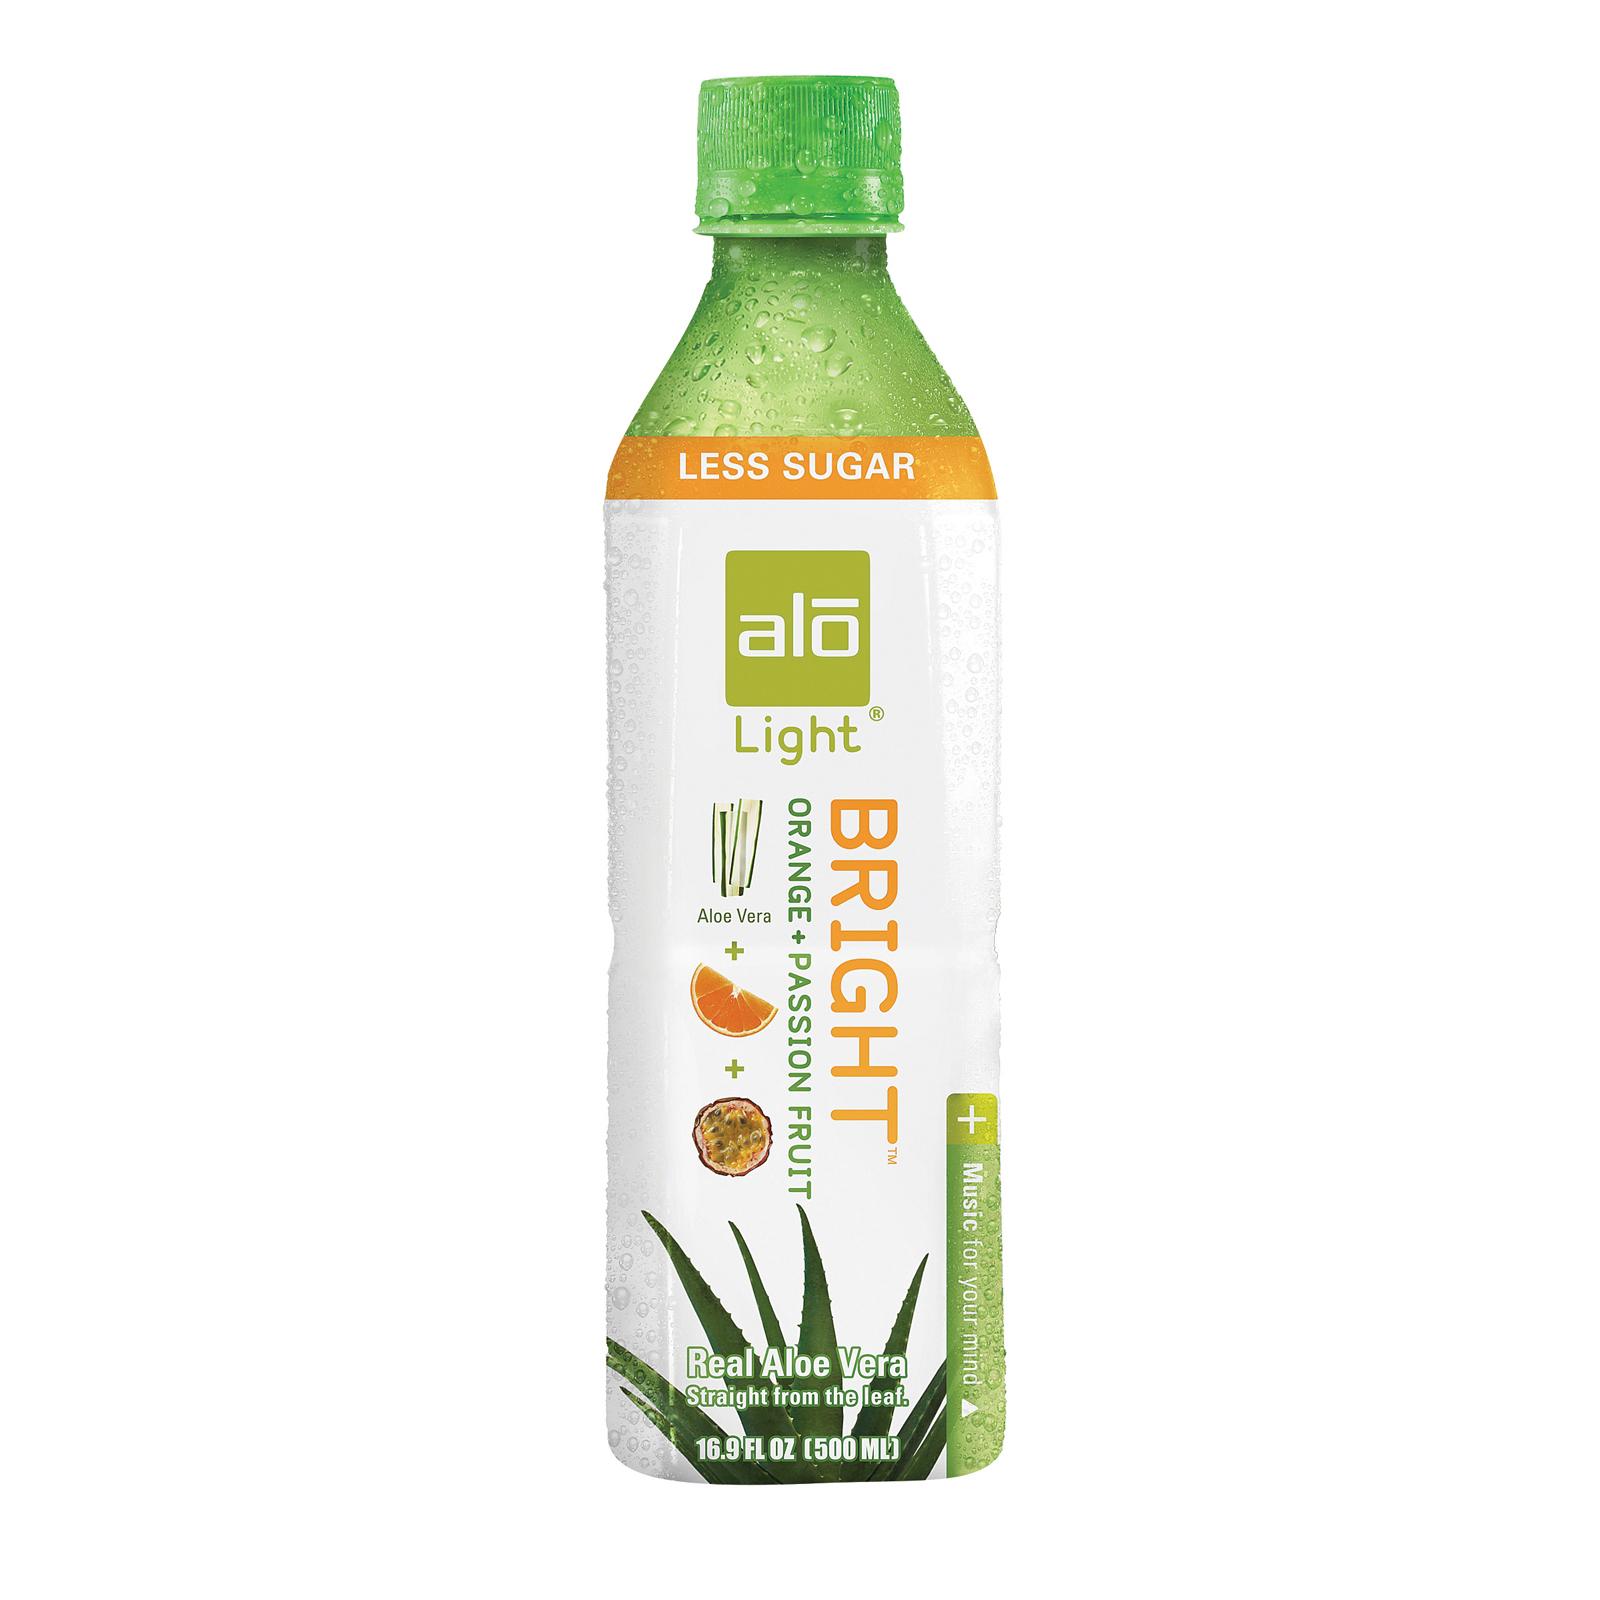 Alo Light Bright Aloe Vera Juice Drink - Orange and Passion Fruit - Case of 12 - 16.9 fl oz.